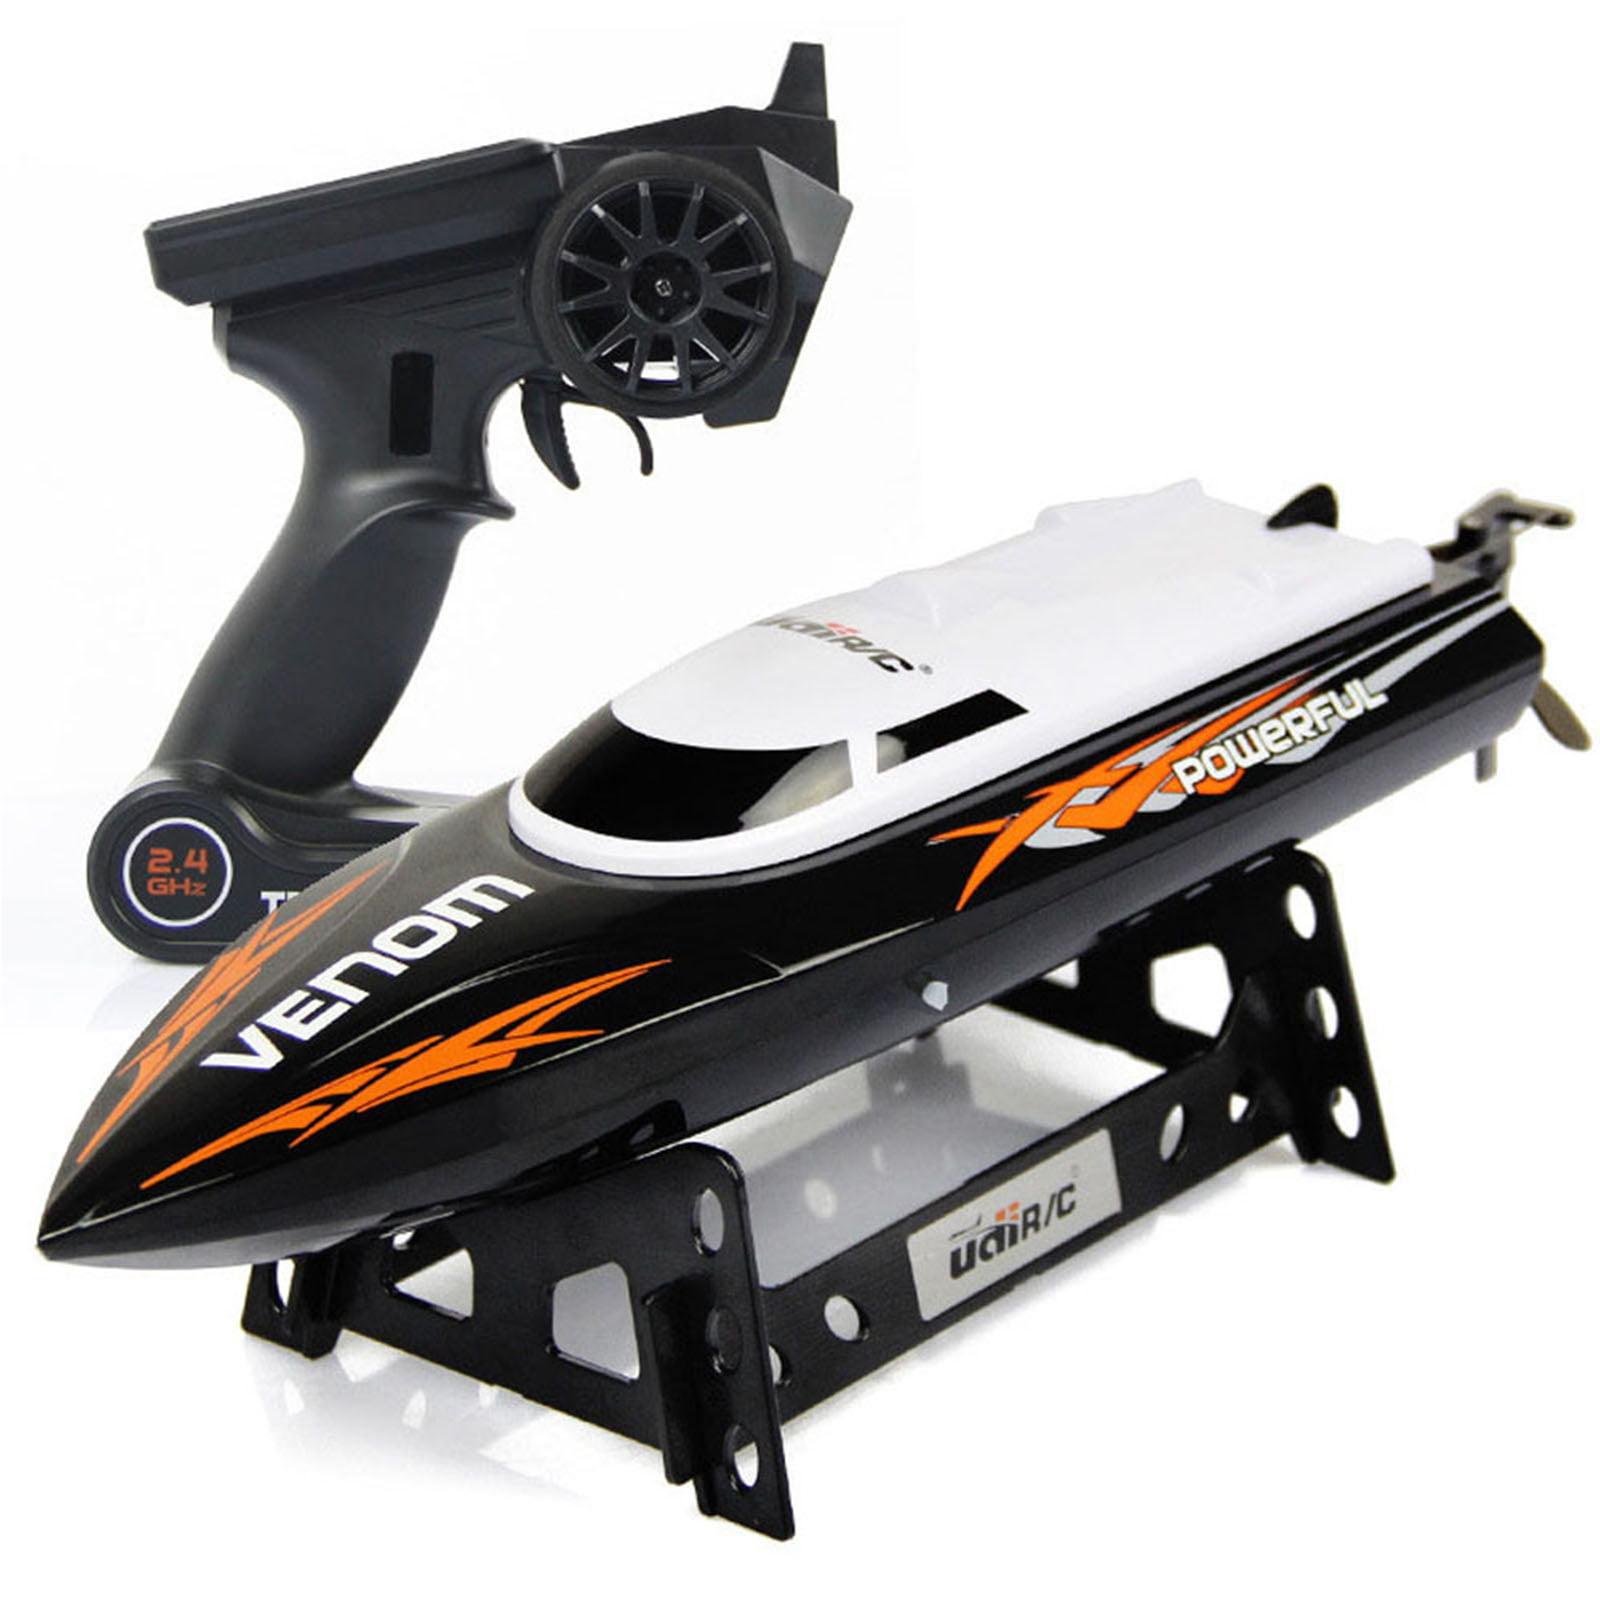 Udirc 2.4GHz High Speed Remote Control Electric Boat (Black) by UDI RC